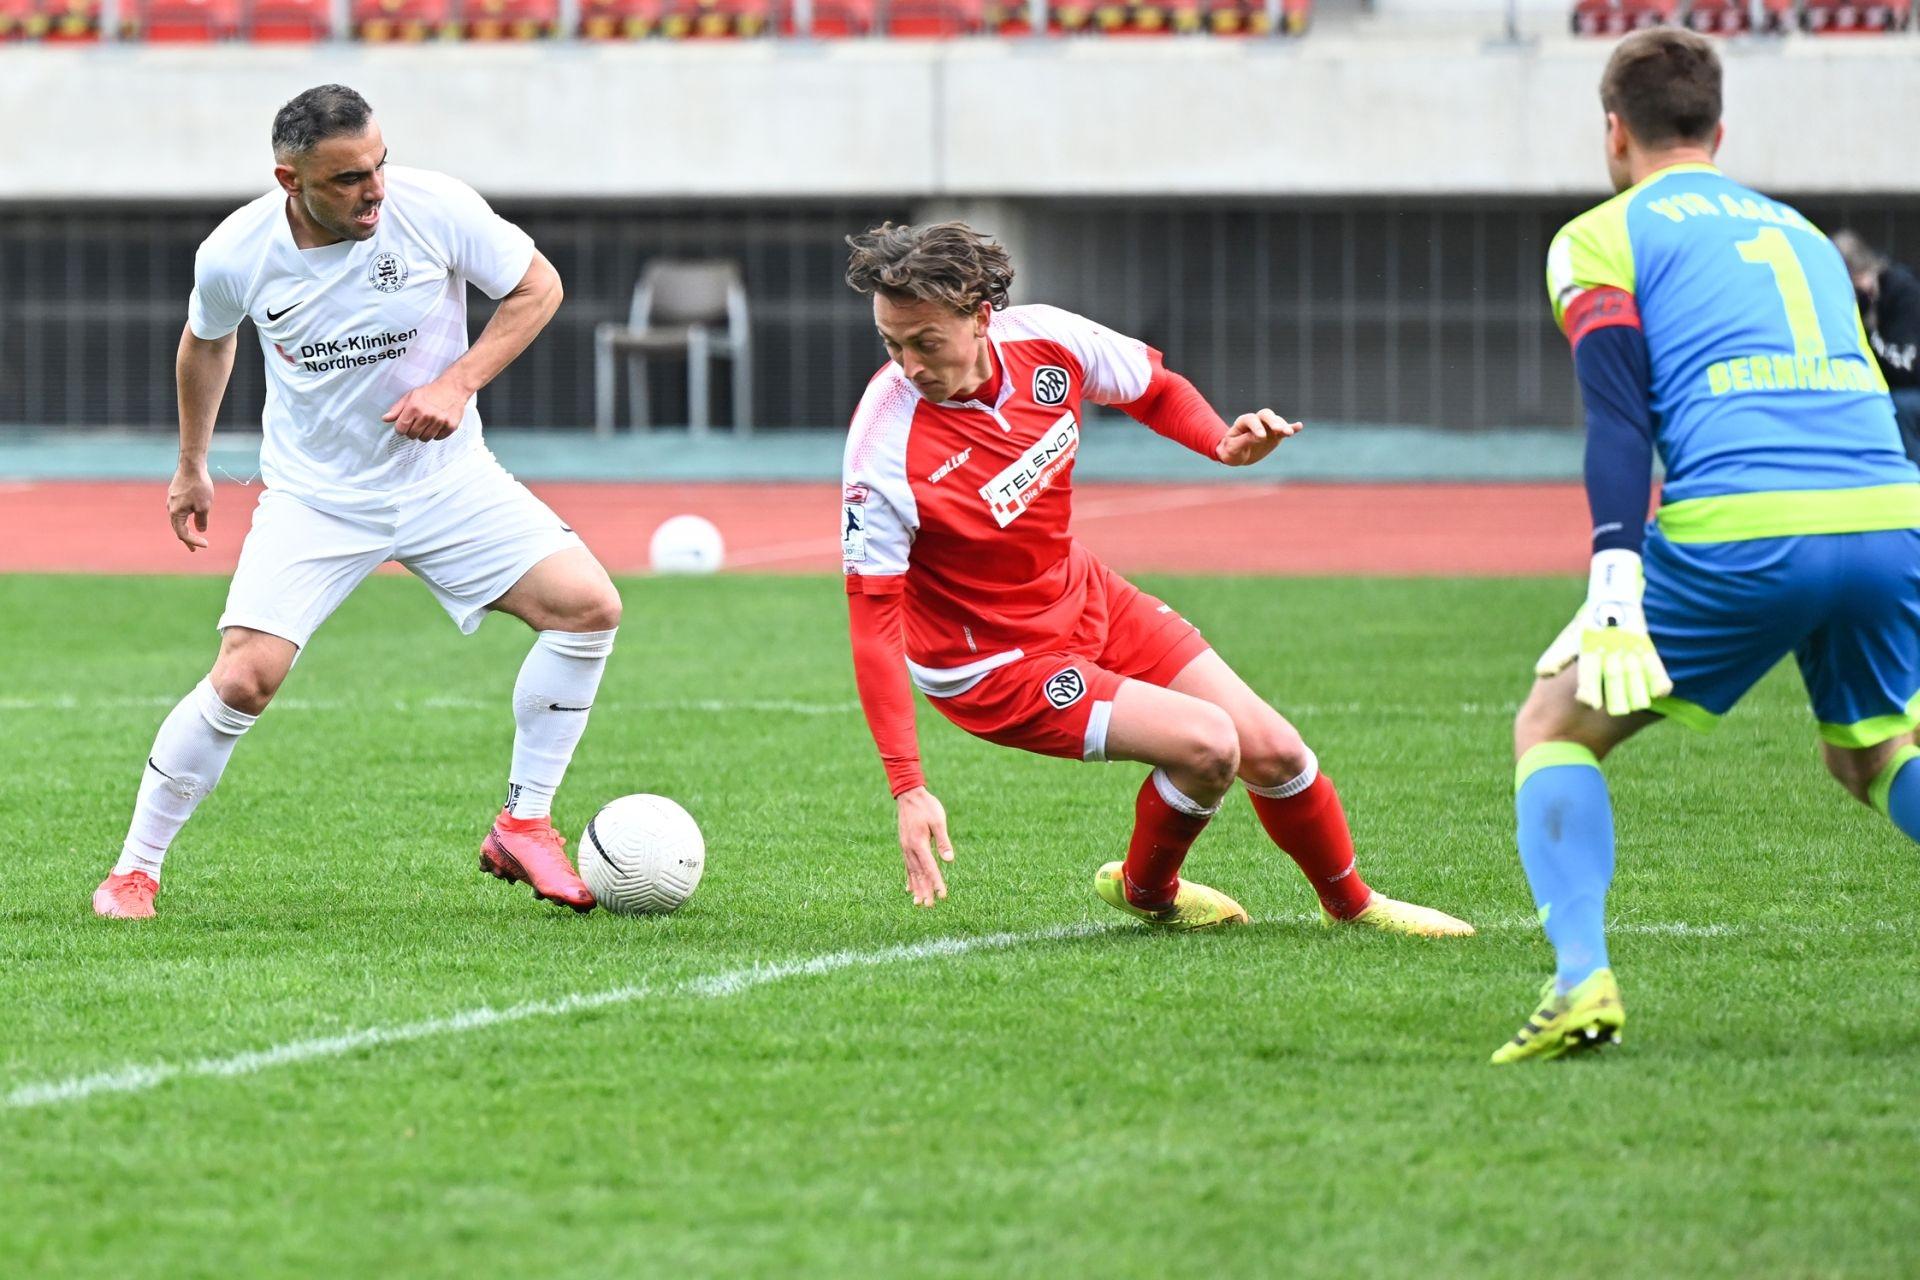 Regionalliga Südwest 2020/21, KSV Hessen Kassel, VfR Aalen, Endstand 1:1, Mahir Saglik